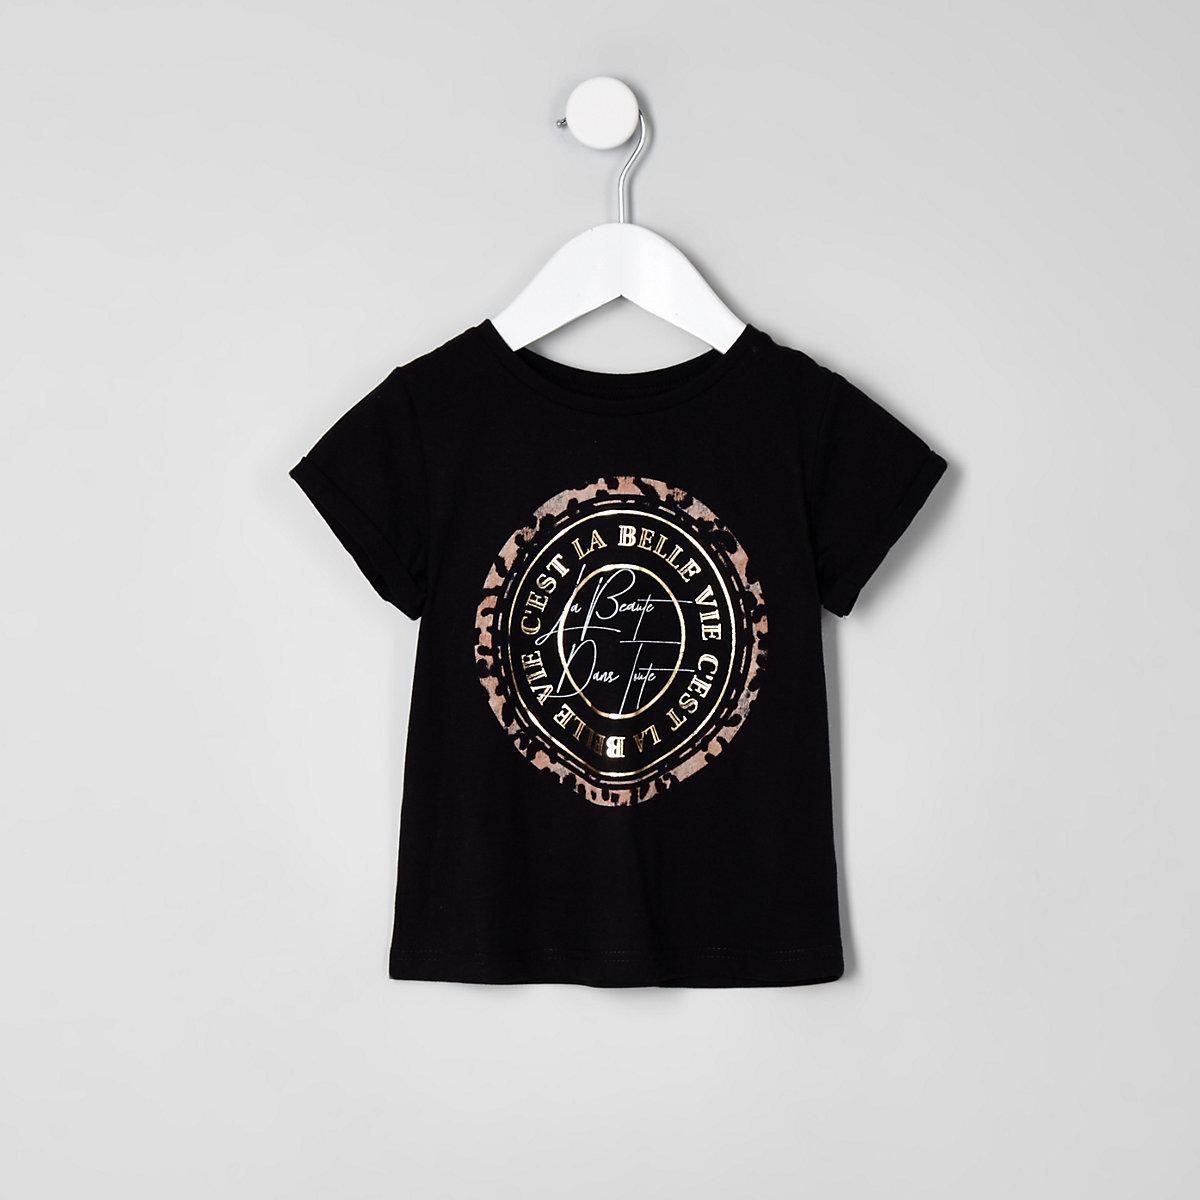 Mini girls black 'beaute' leopard print top